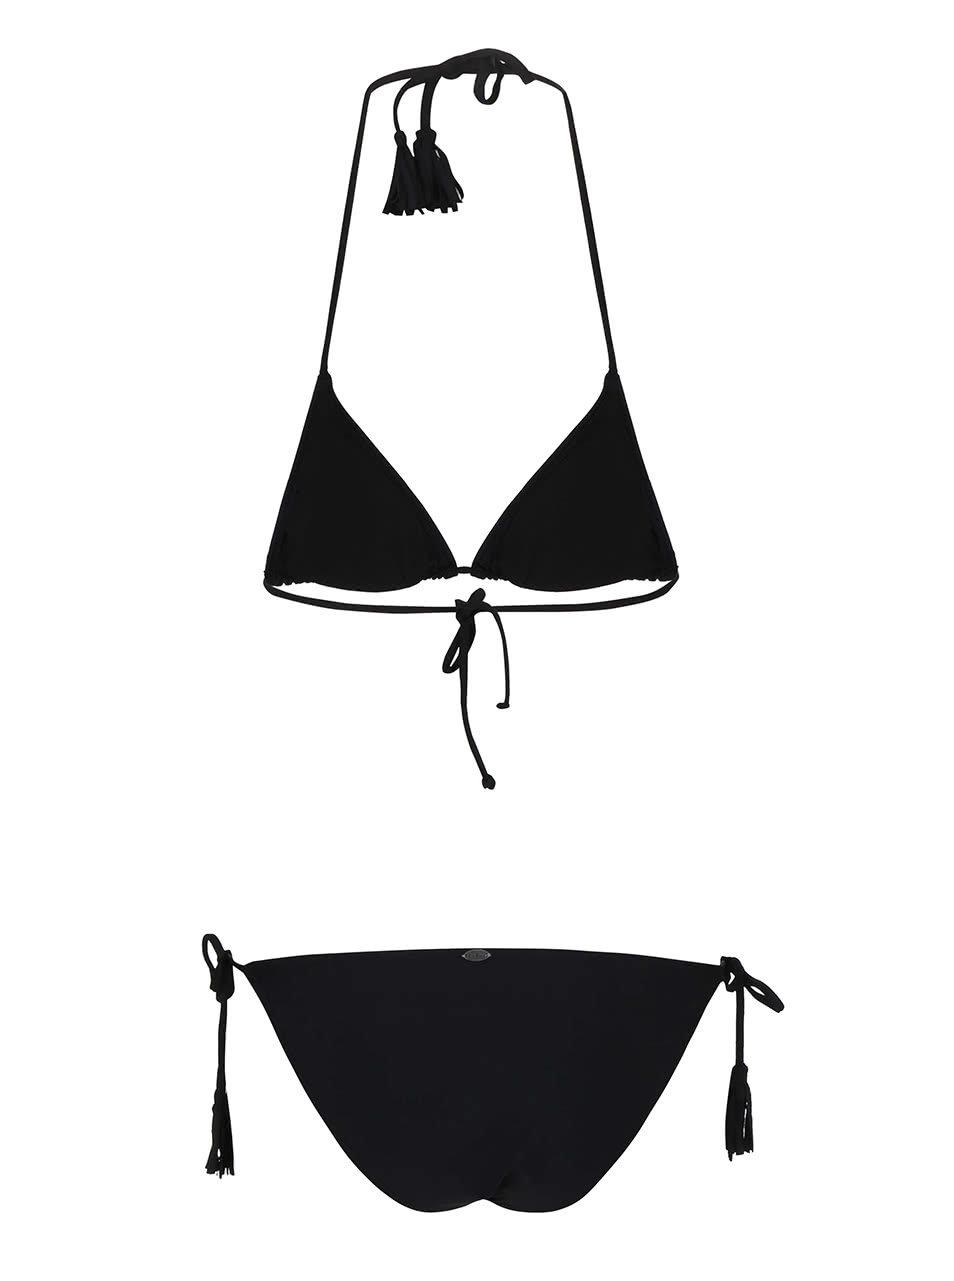 64f4d5281 Čierne plavky O'Neill Solid Triangle | ZOOT.sk